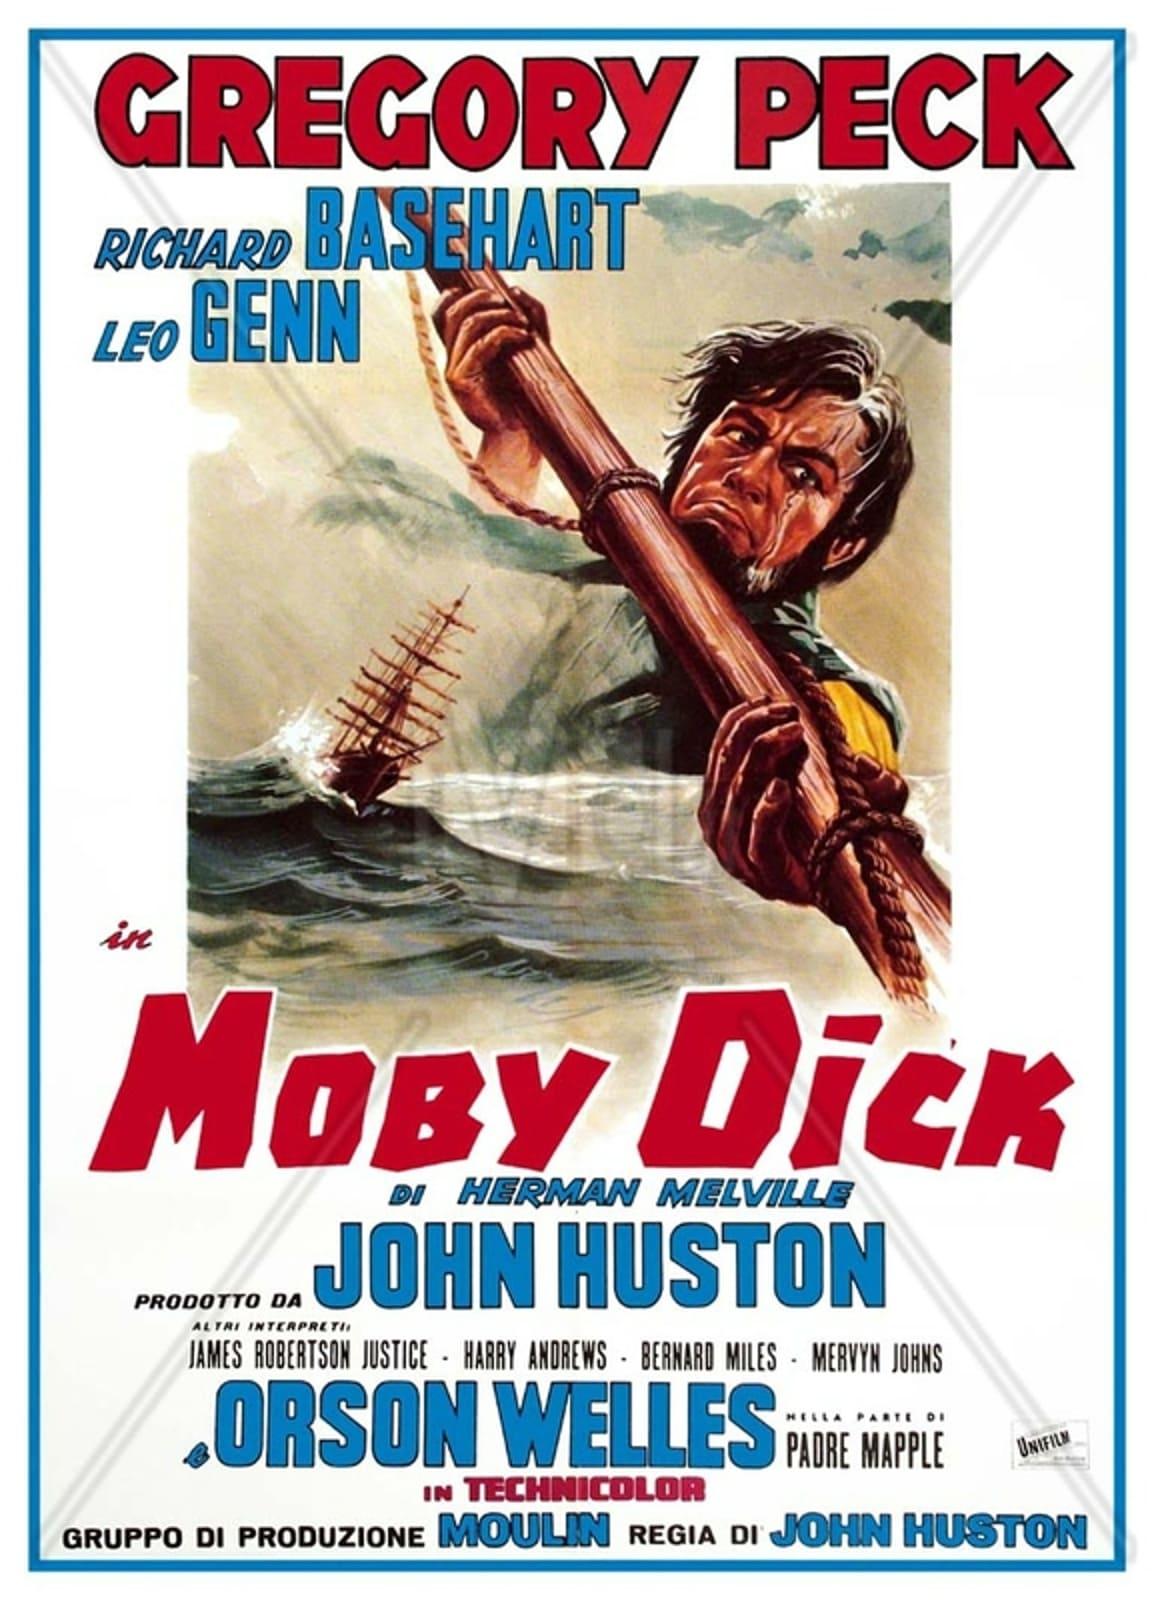 Strategi prime nummer Moby Dick gäst